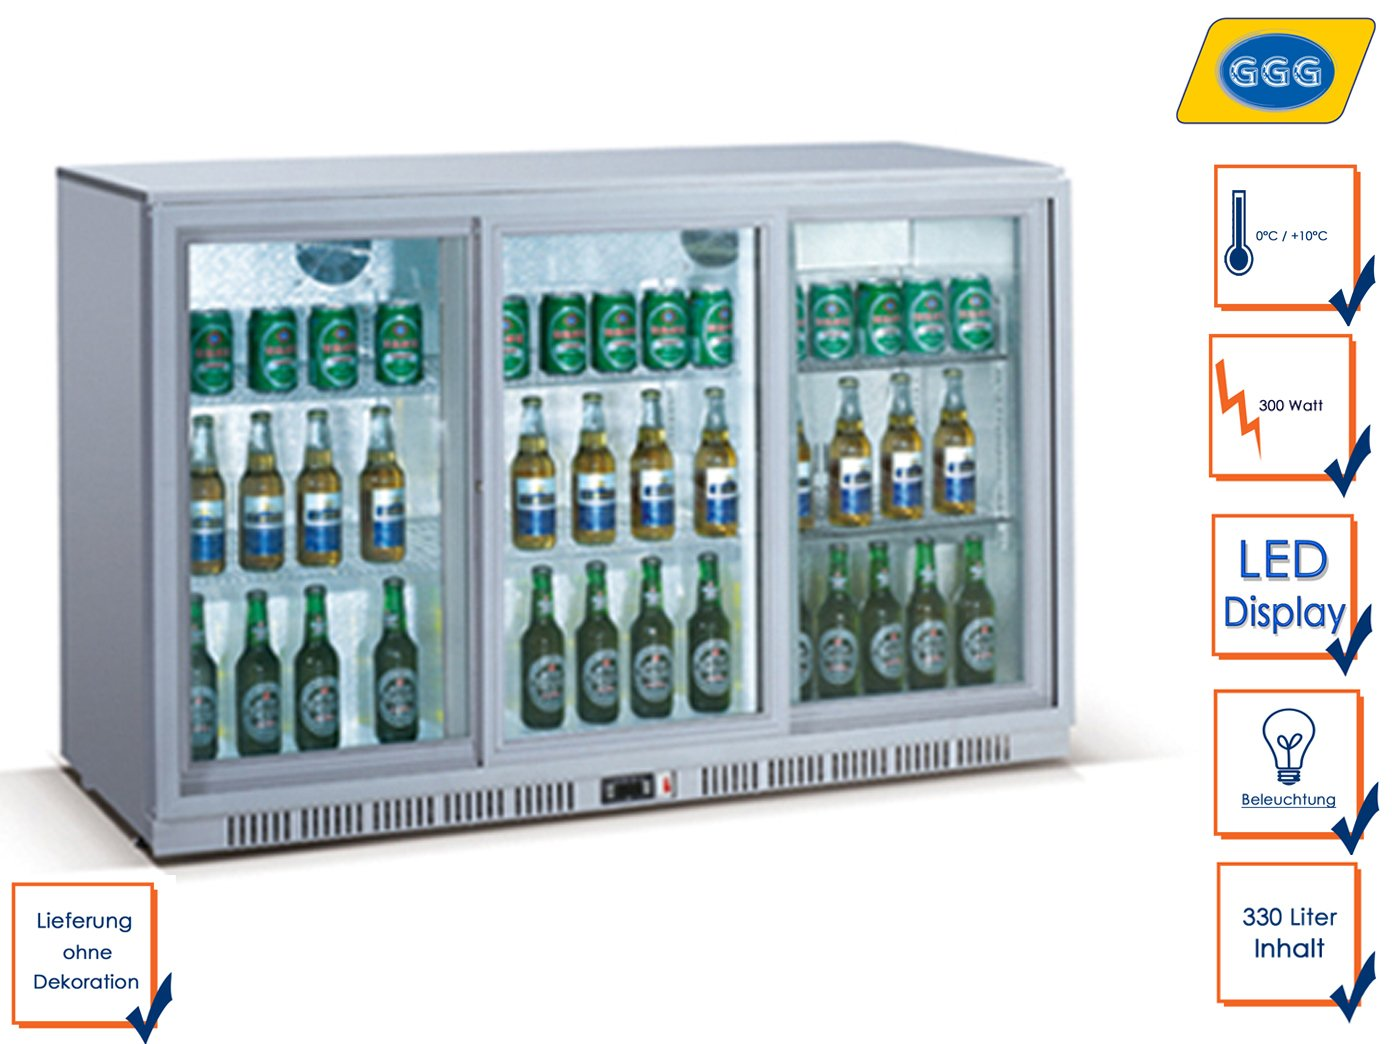 Minibar Kühlschrank Abschließbar : Profi flaschenkühlschrank liter ° c ° c umluftkühlung